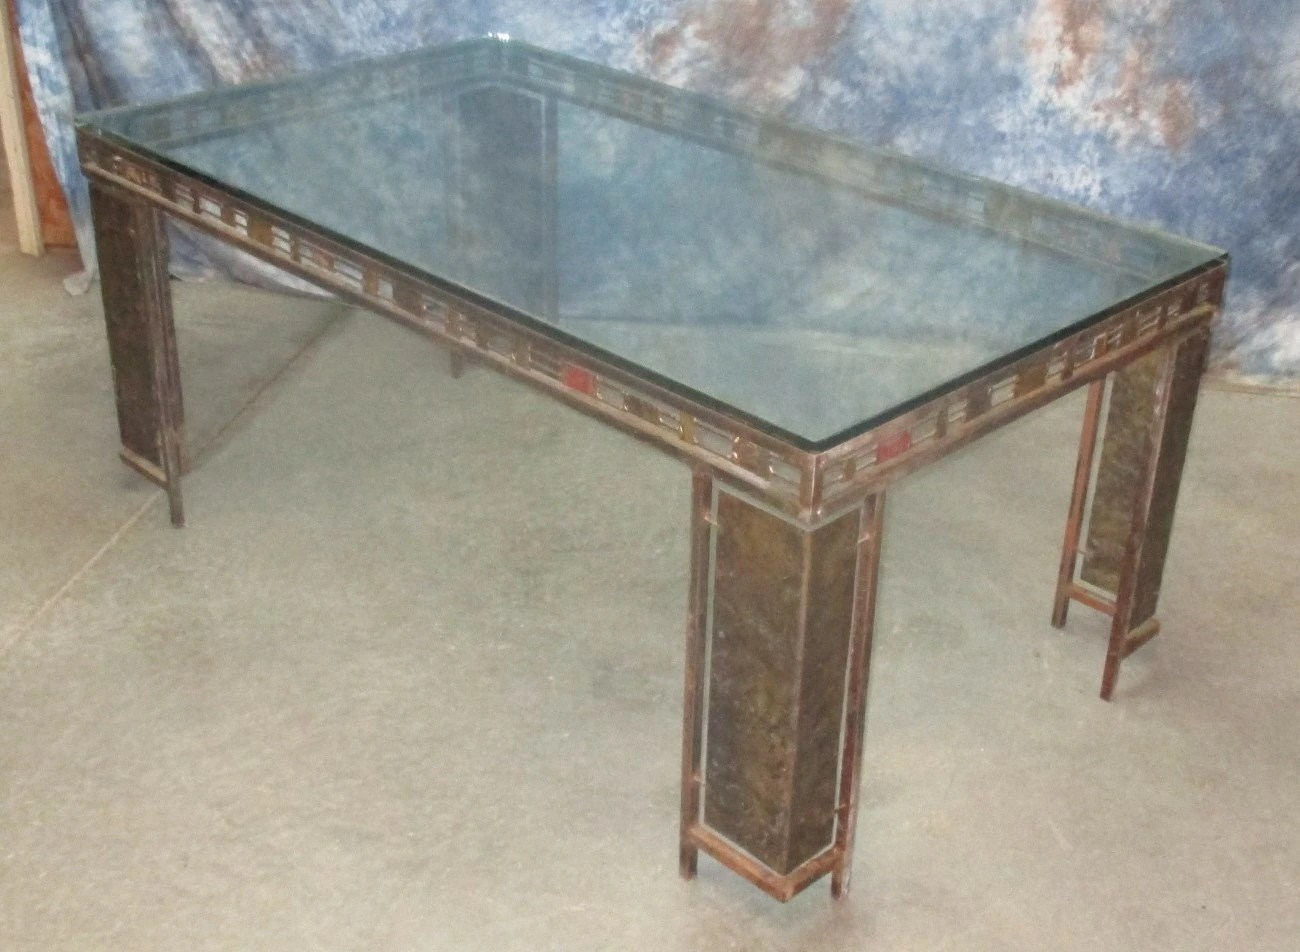 38 X 68 Glass Top Table Dining Room Kitchen Mid Century Danish Modern Retro Haute Juice